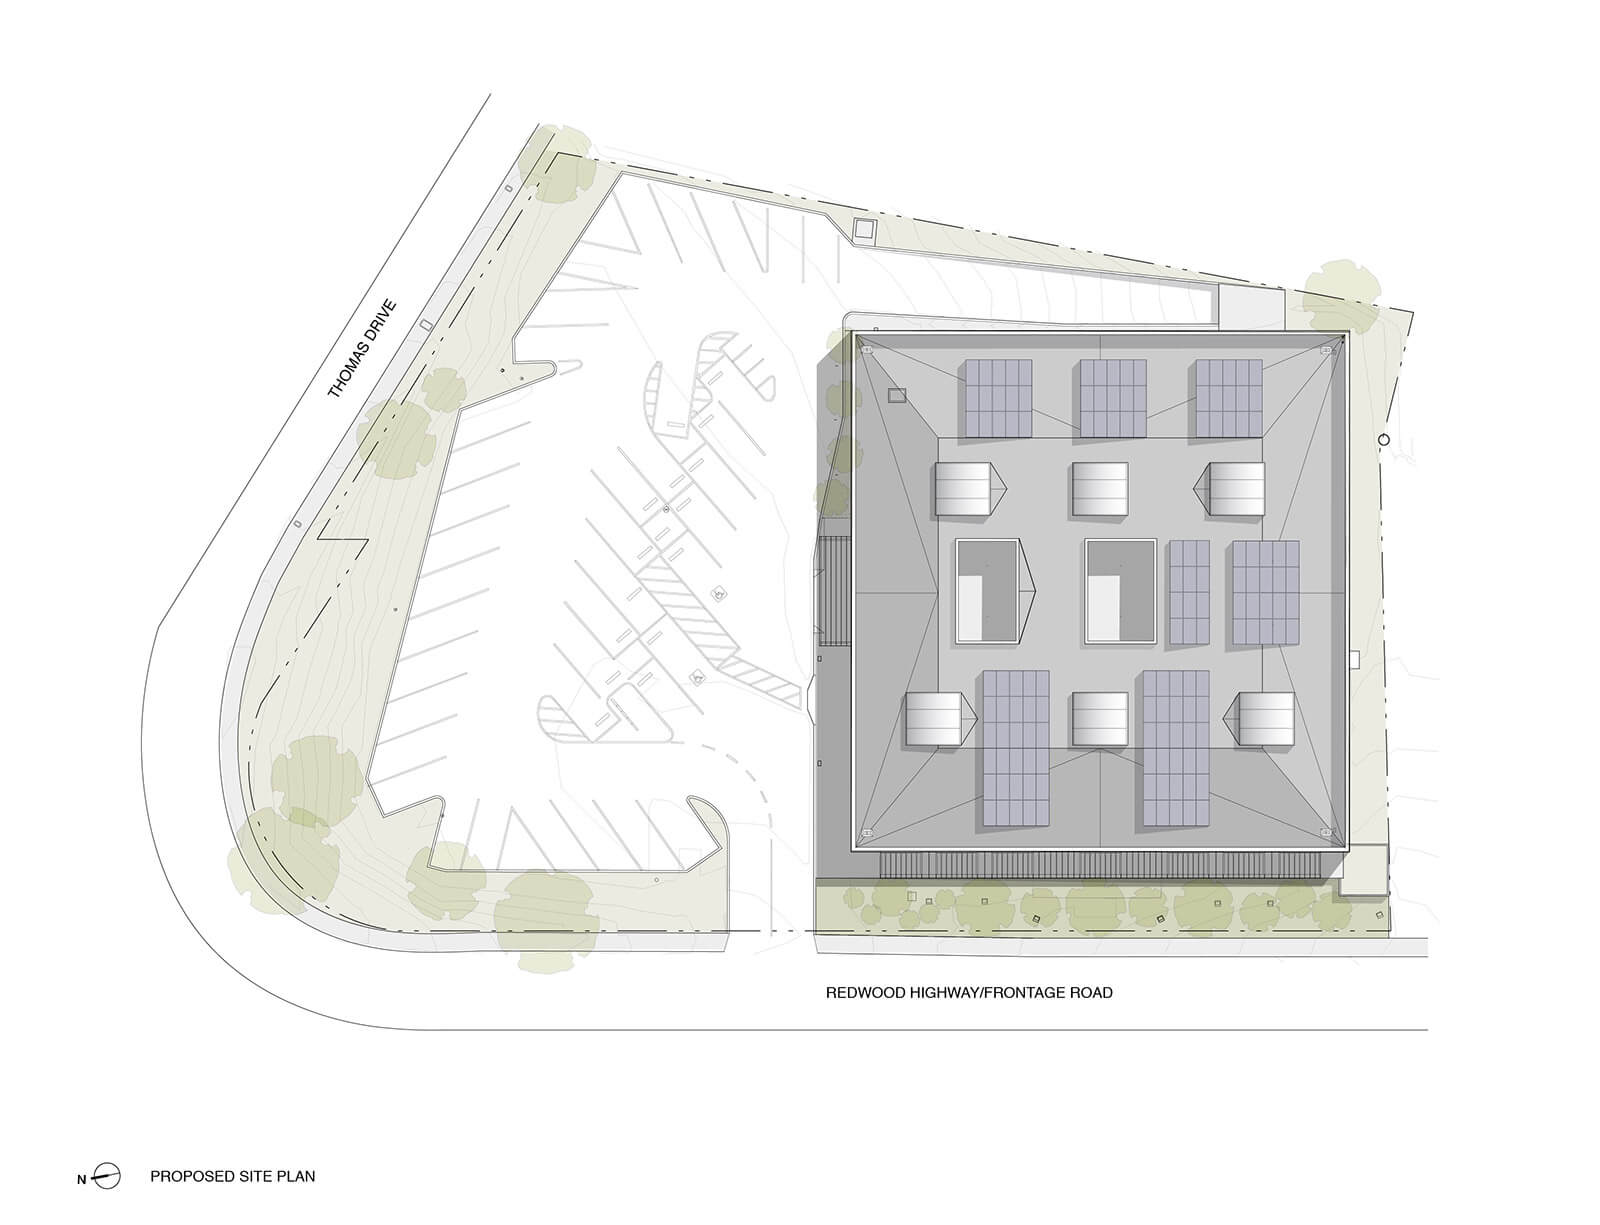 studio vara workplace redwood highway drawing proposed site plan